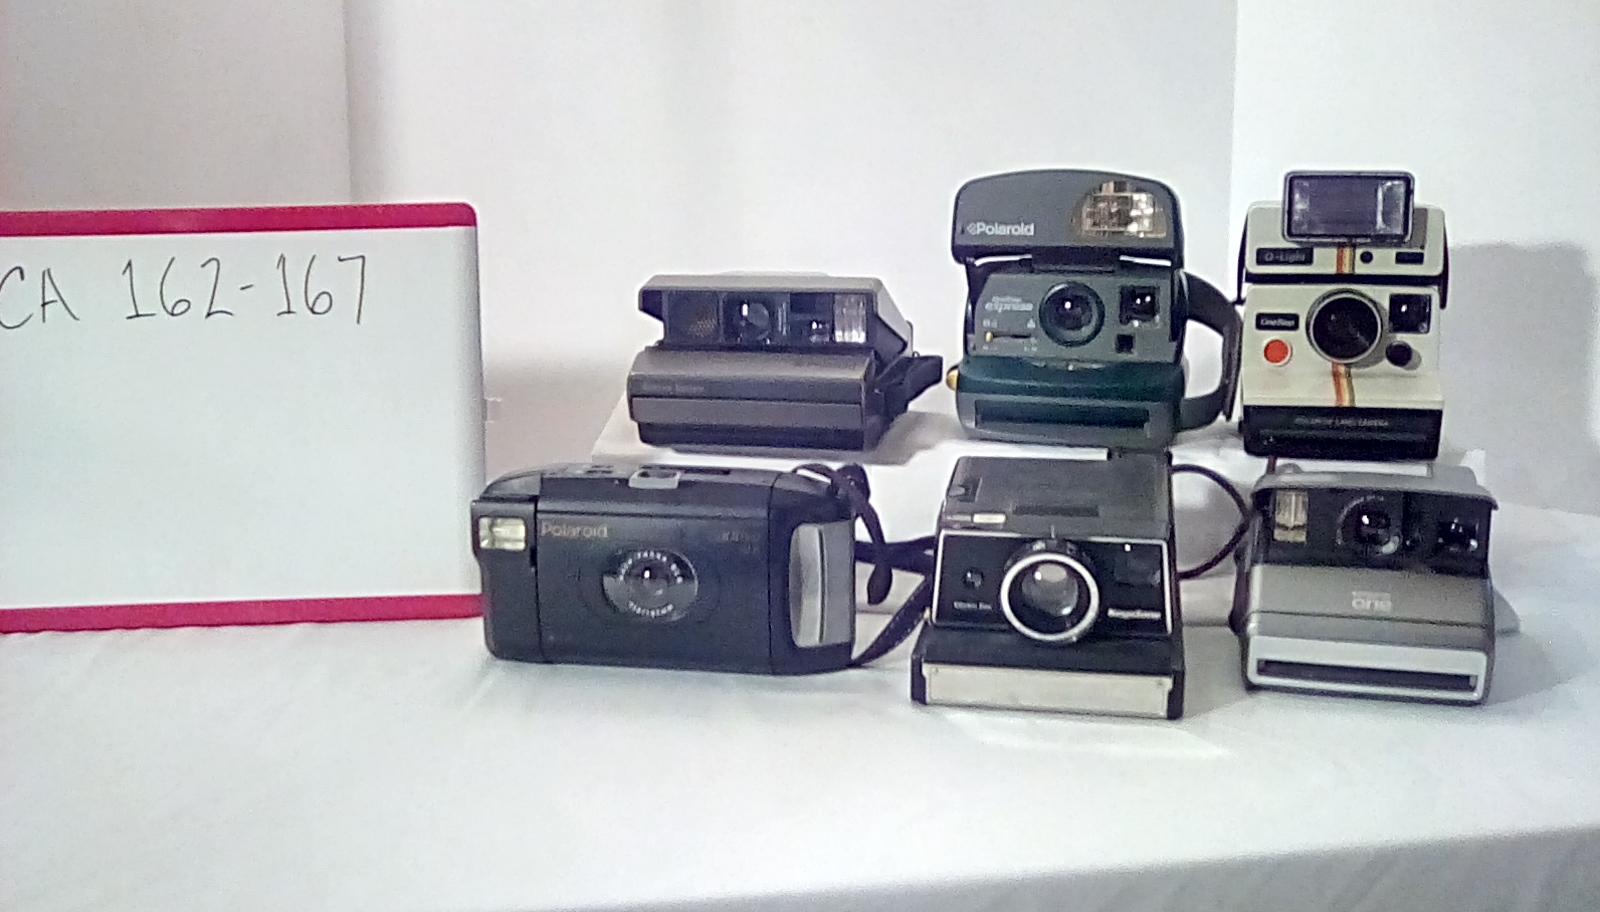 CA162 Polaroid spectra system w/case & hand strap, CA165 Polaroid captiva SLR w/neck strap, CA163 Polaroid 1 step express w/hand strap, CA167 Polaroid 1 w/wrist strap, CA164 polaroid 1 step light w/neck strap, CA166 Keystone electric eye w/neck strap